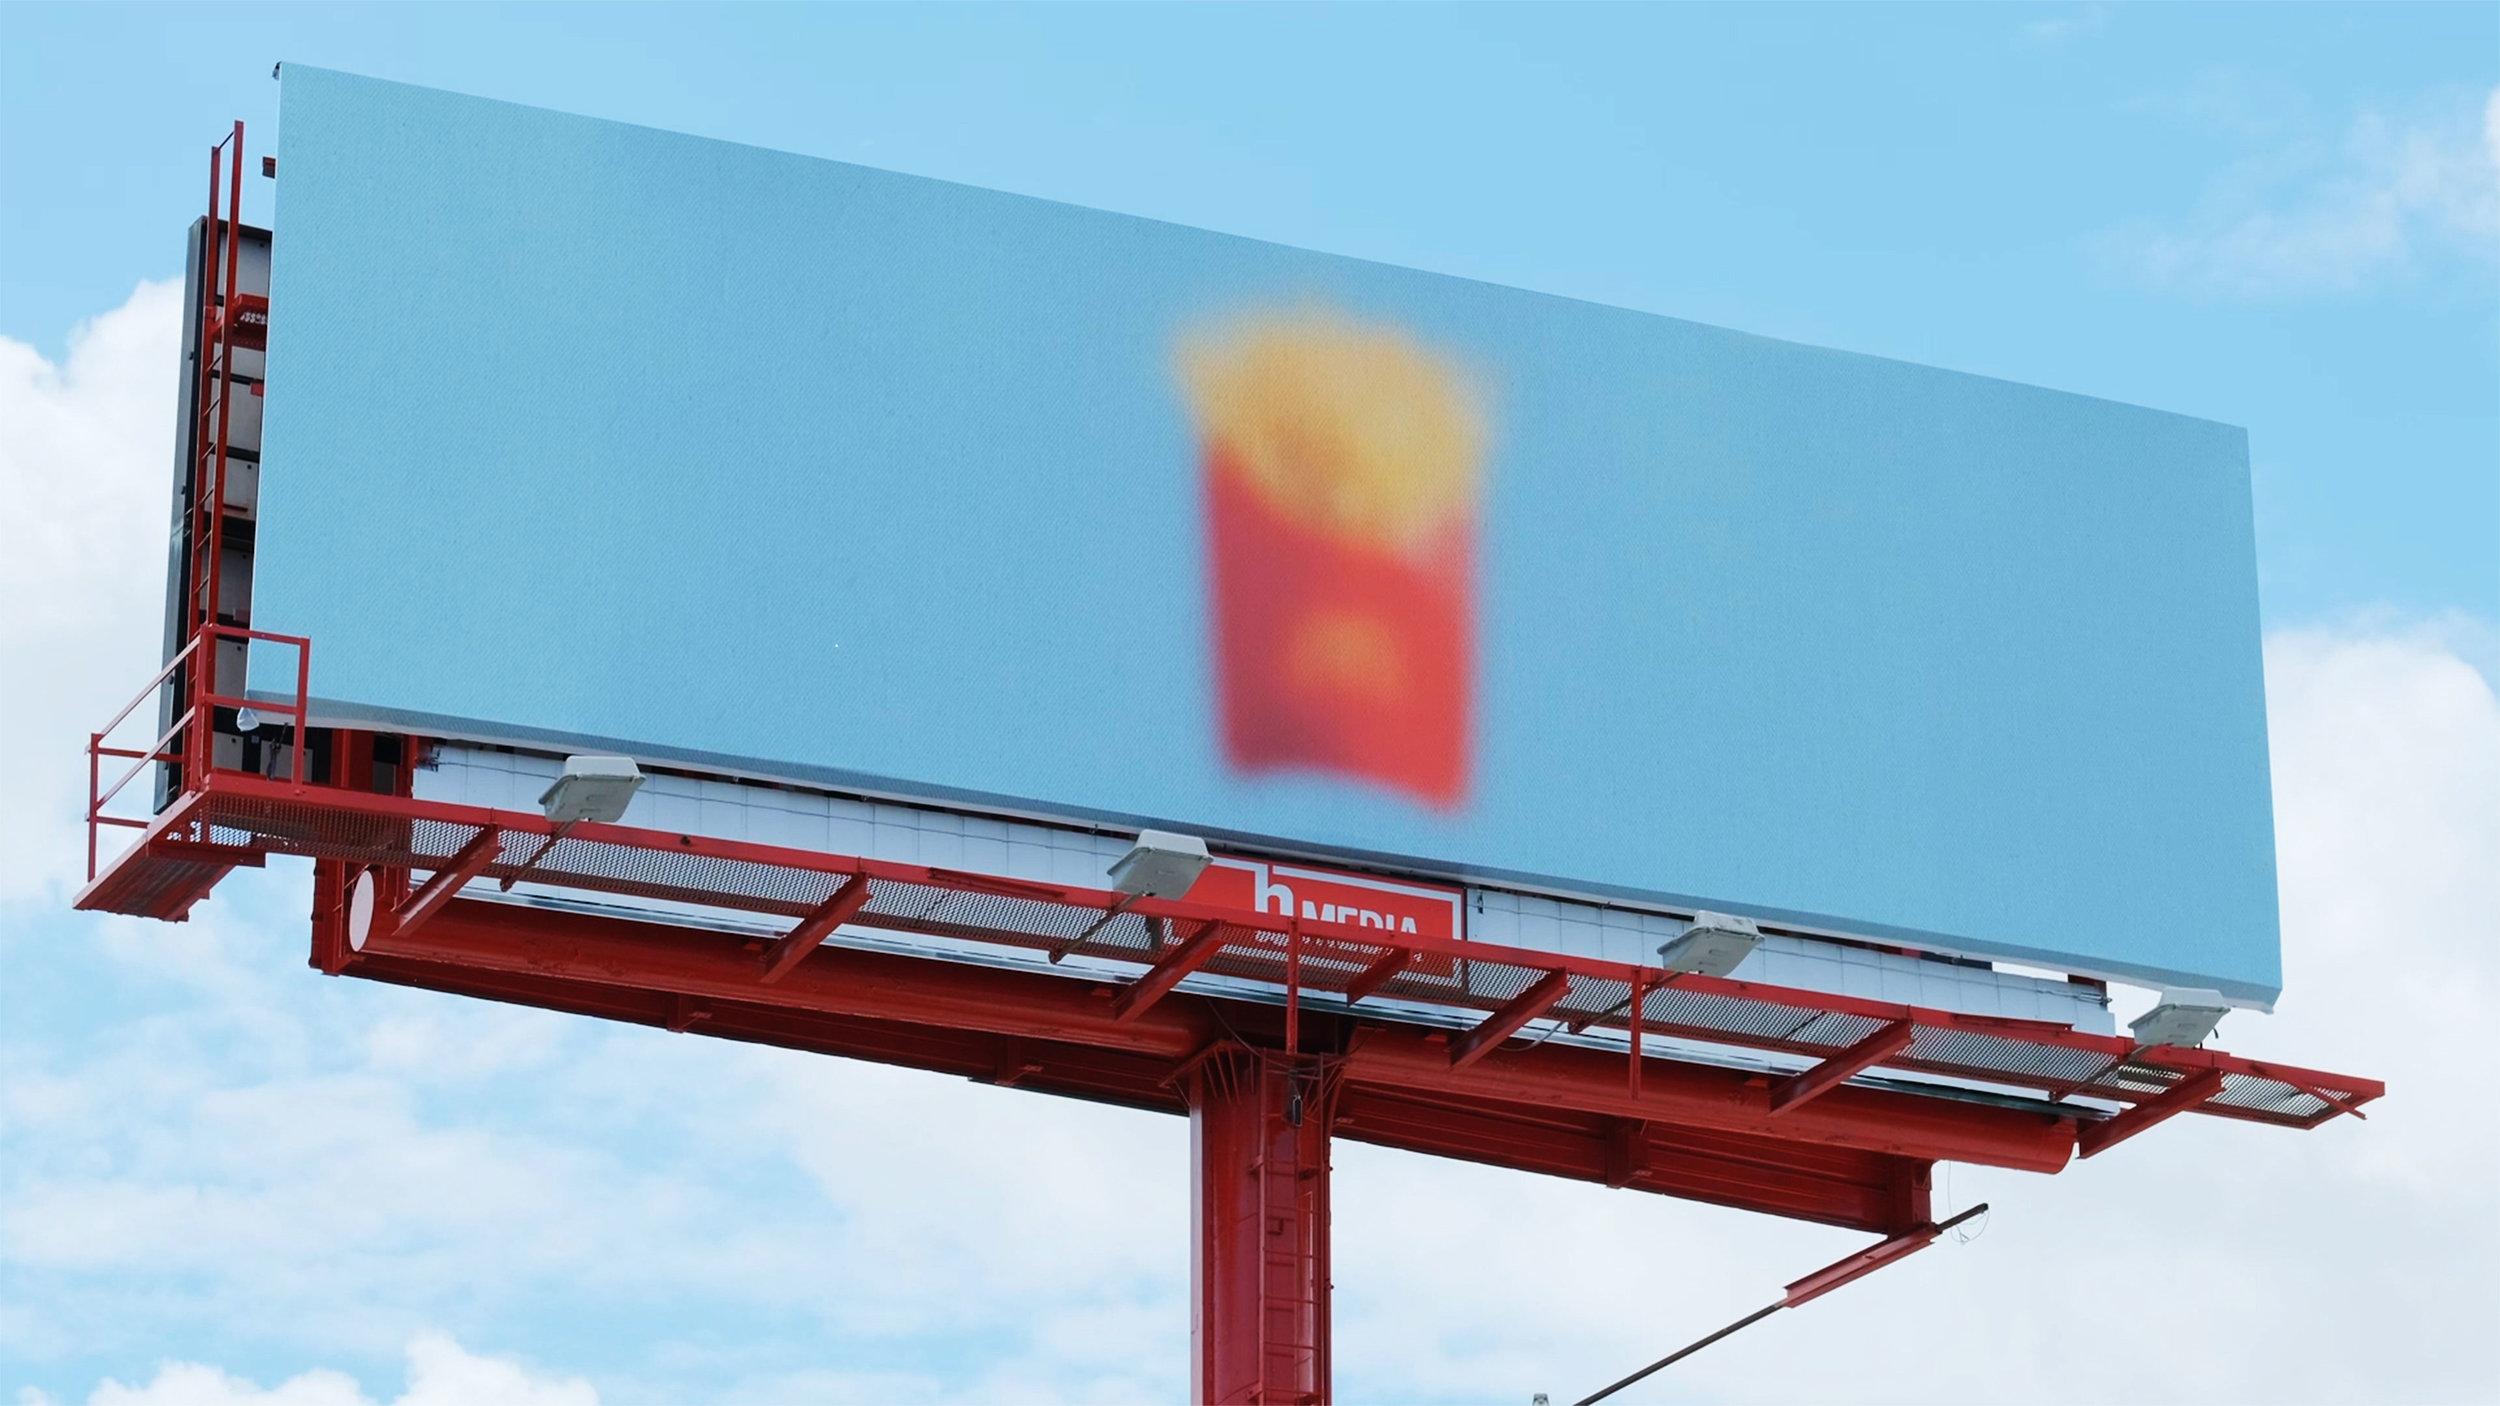 Traditional Billboard_Say No More - Fries.jpg